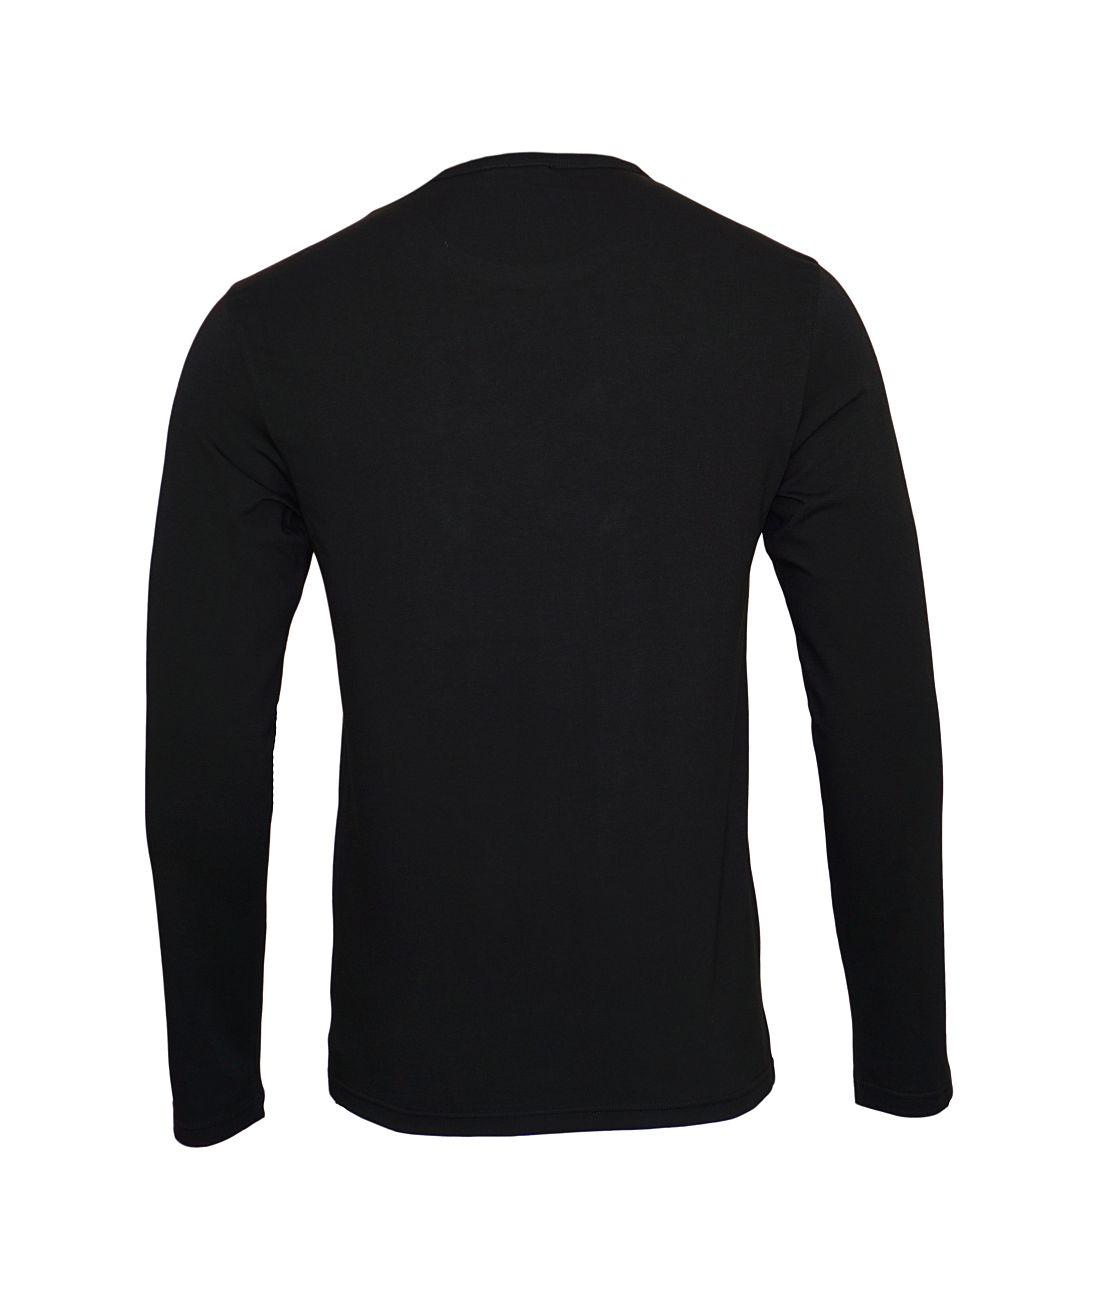 Emporio Armani Longsleeve Rundhals Shirt 111653 8A715 00020 NERO WX18-EAX